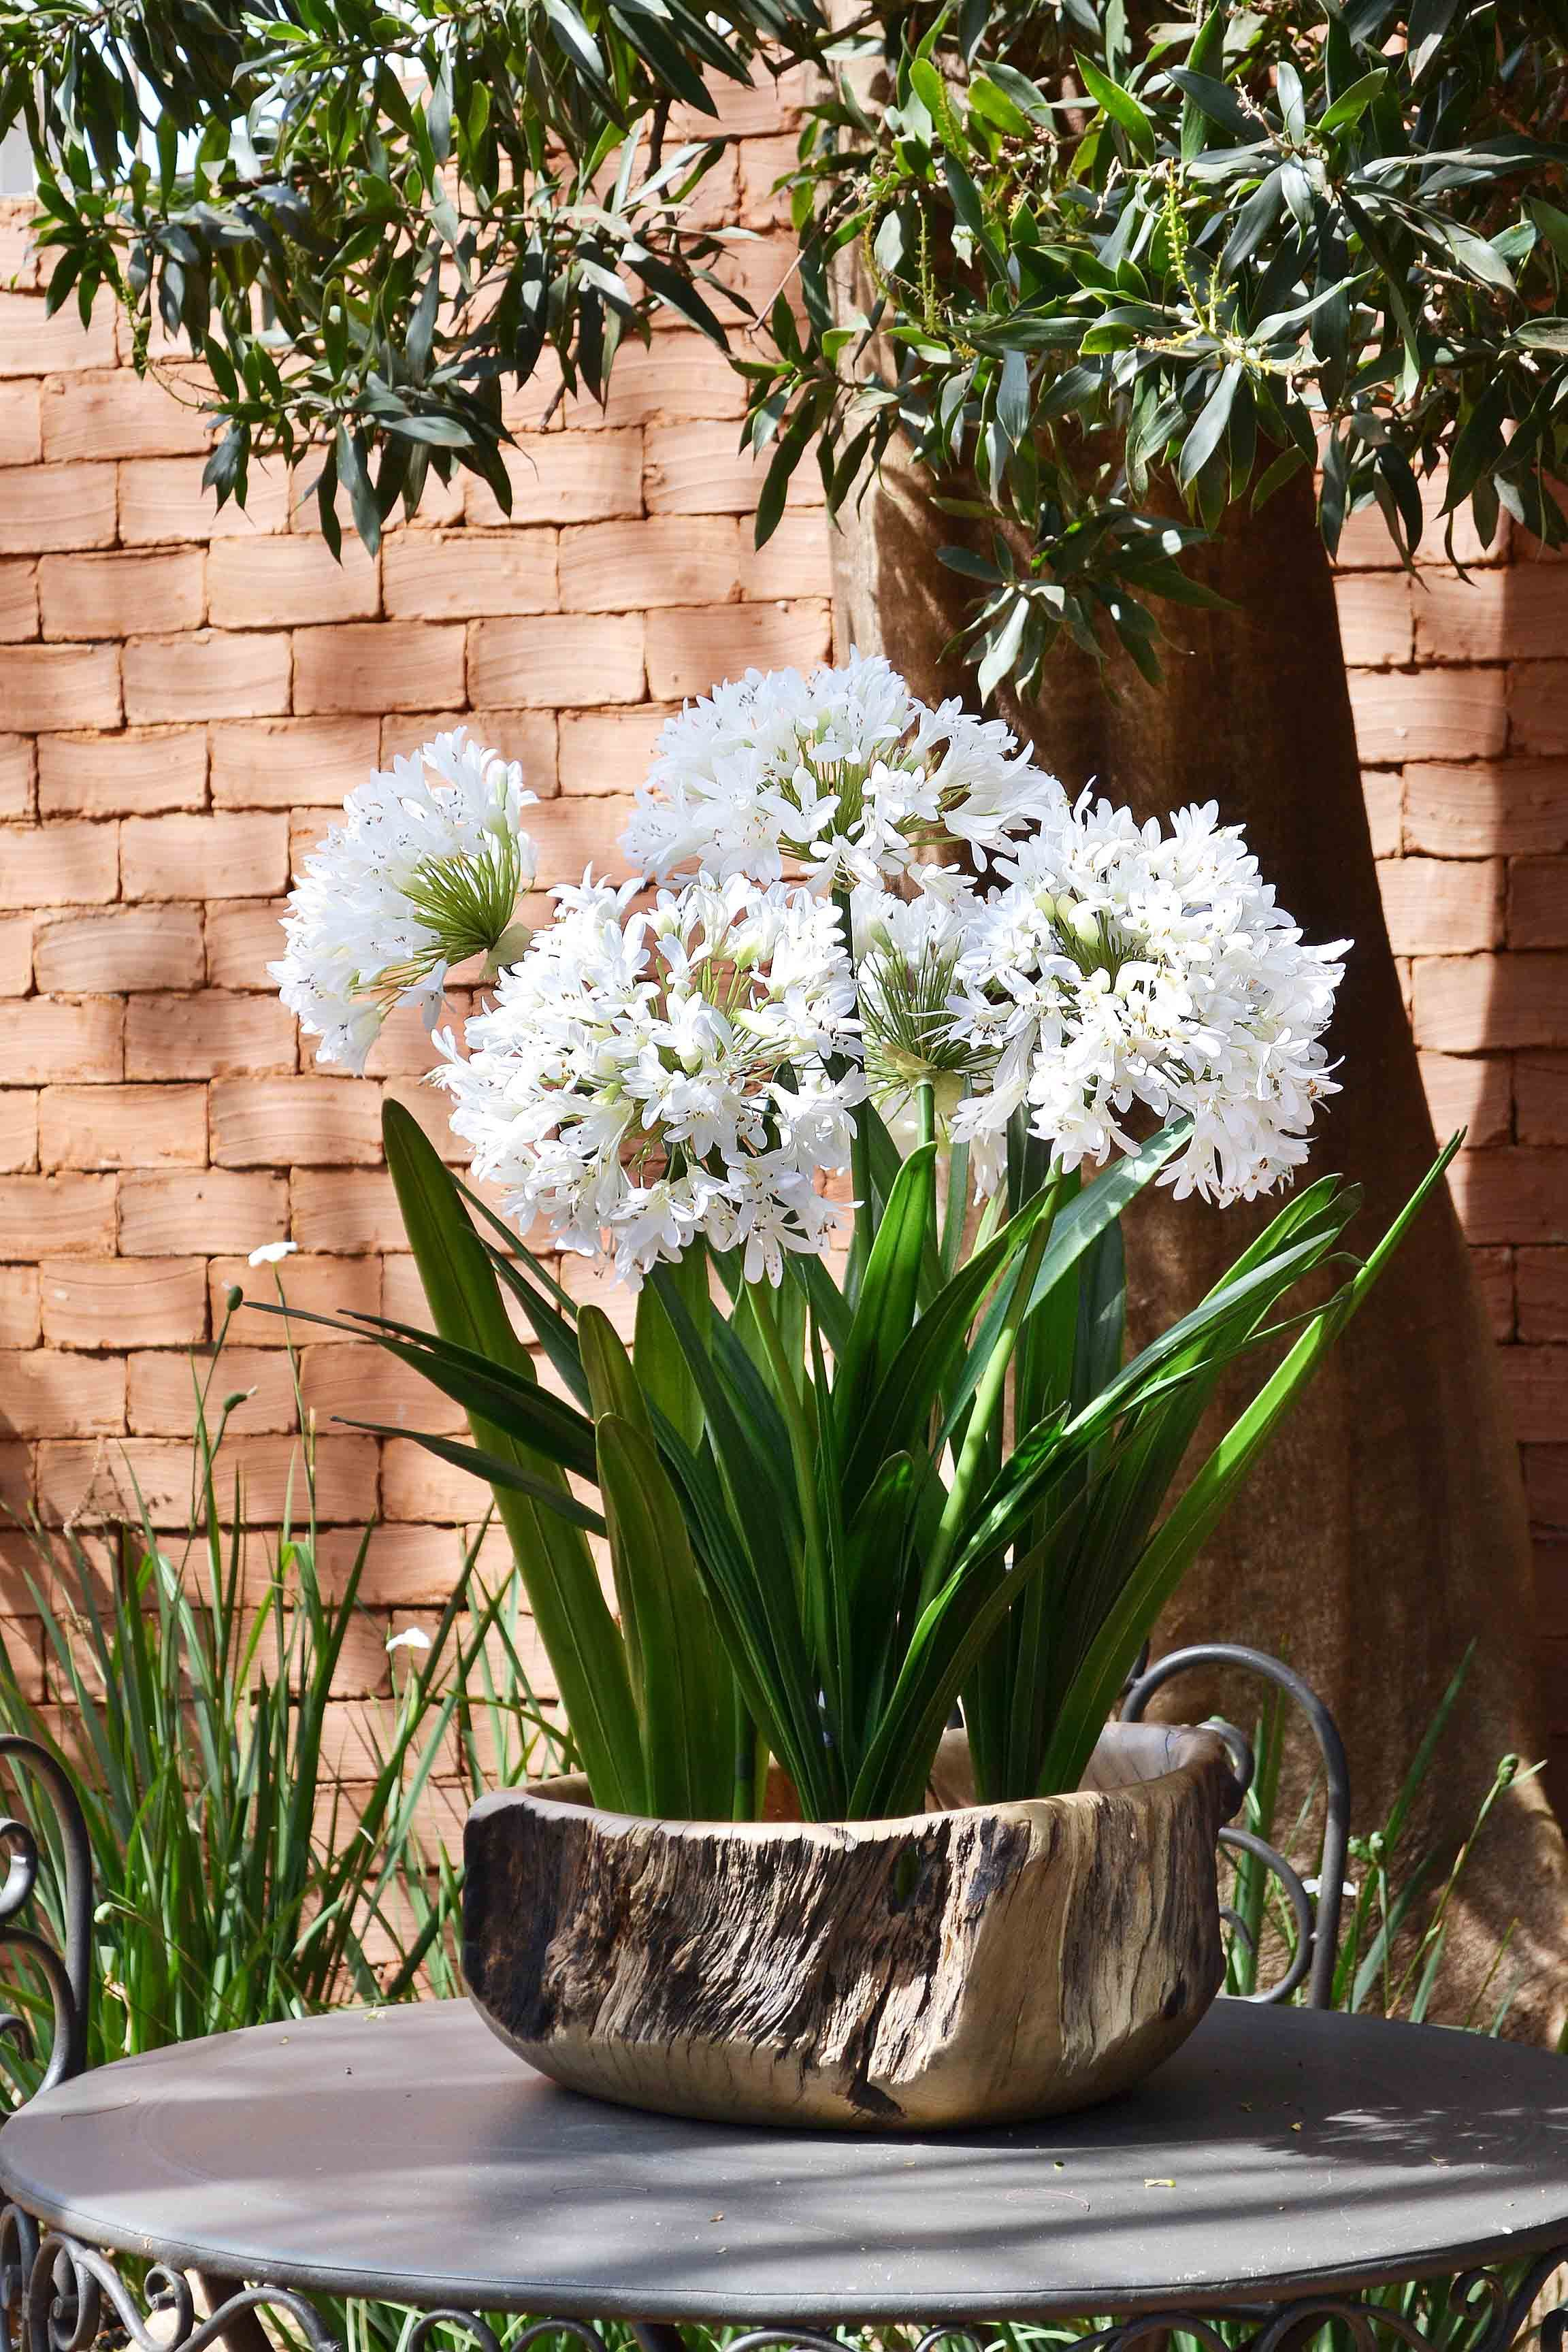 Agapanthus Agapanthuswhite Flowerscontainer Gardeninghanging Plantsgarden